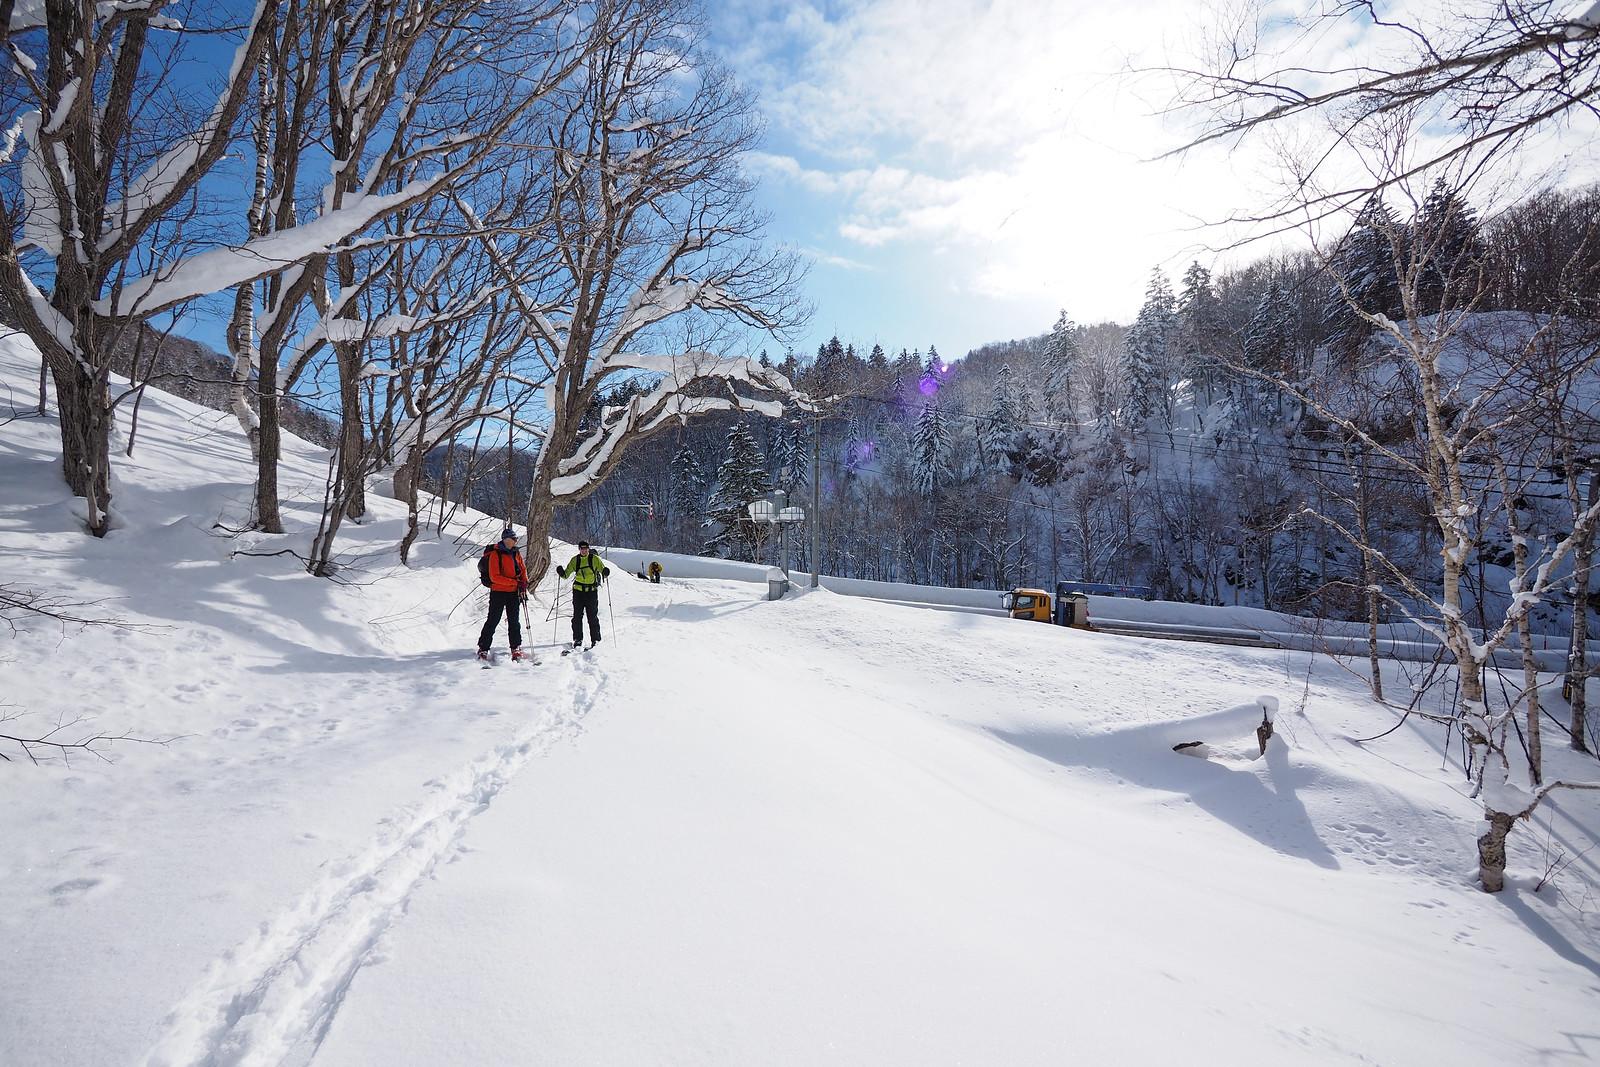 Mt. Kokimobetsu-dake backcountry ski touring (Nakayama Pass, Hokkaido, Japan)